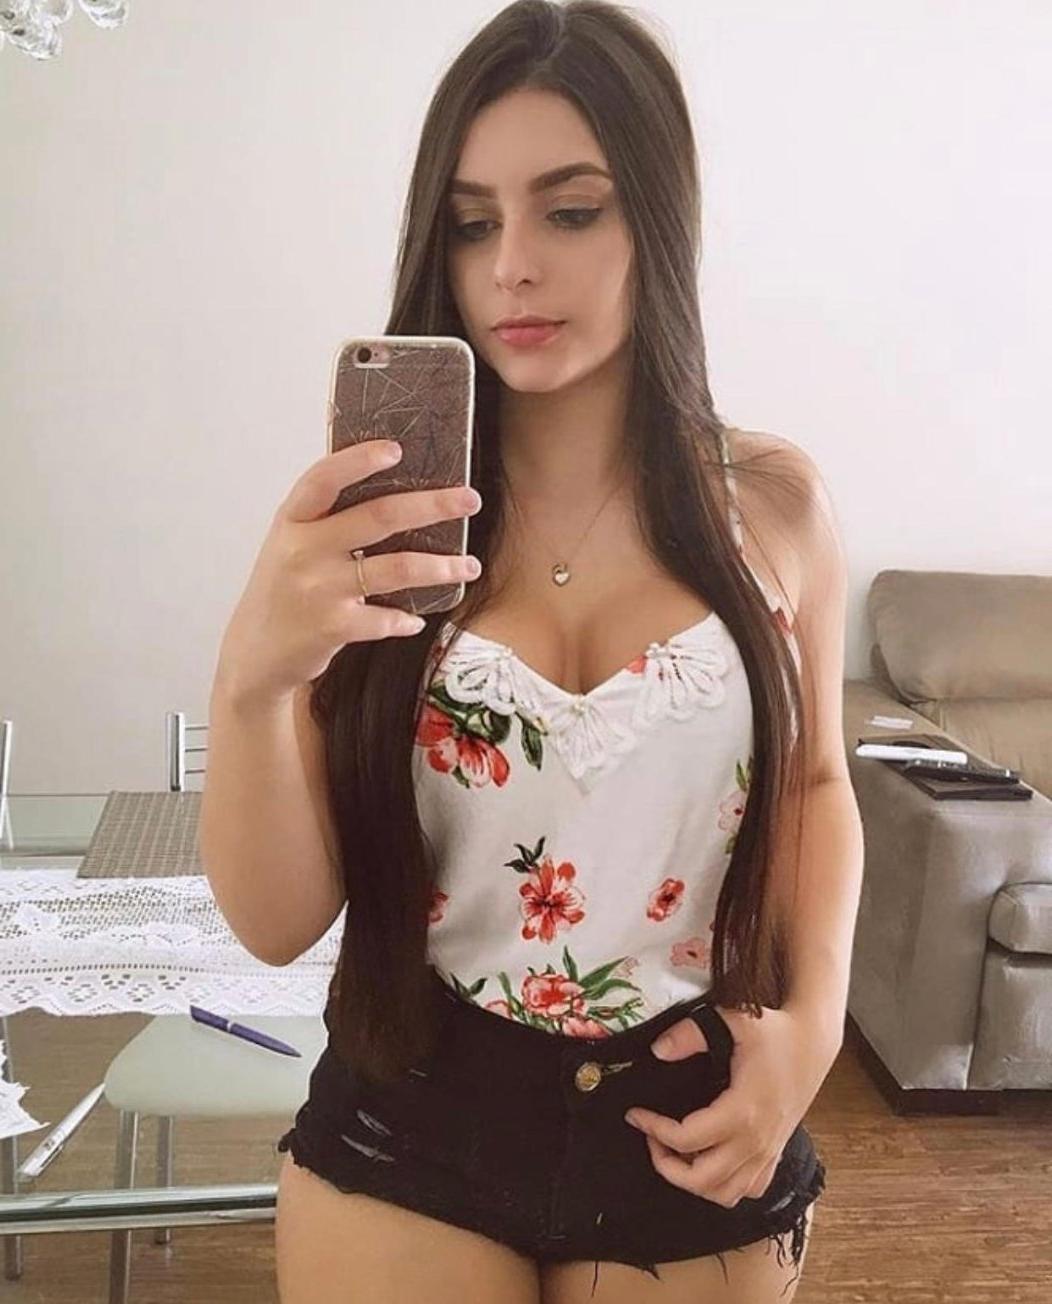 Путана Ирэн, 26 лет, метро Орехово